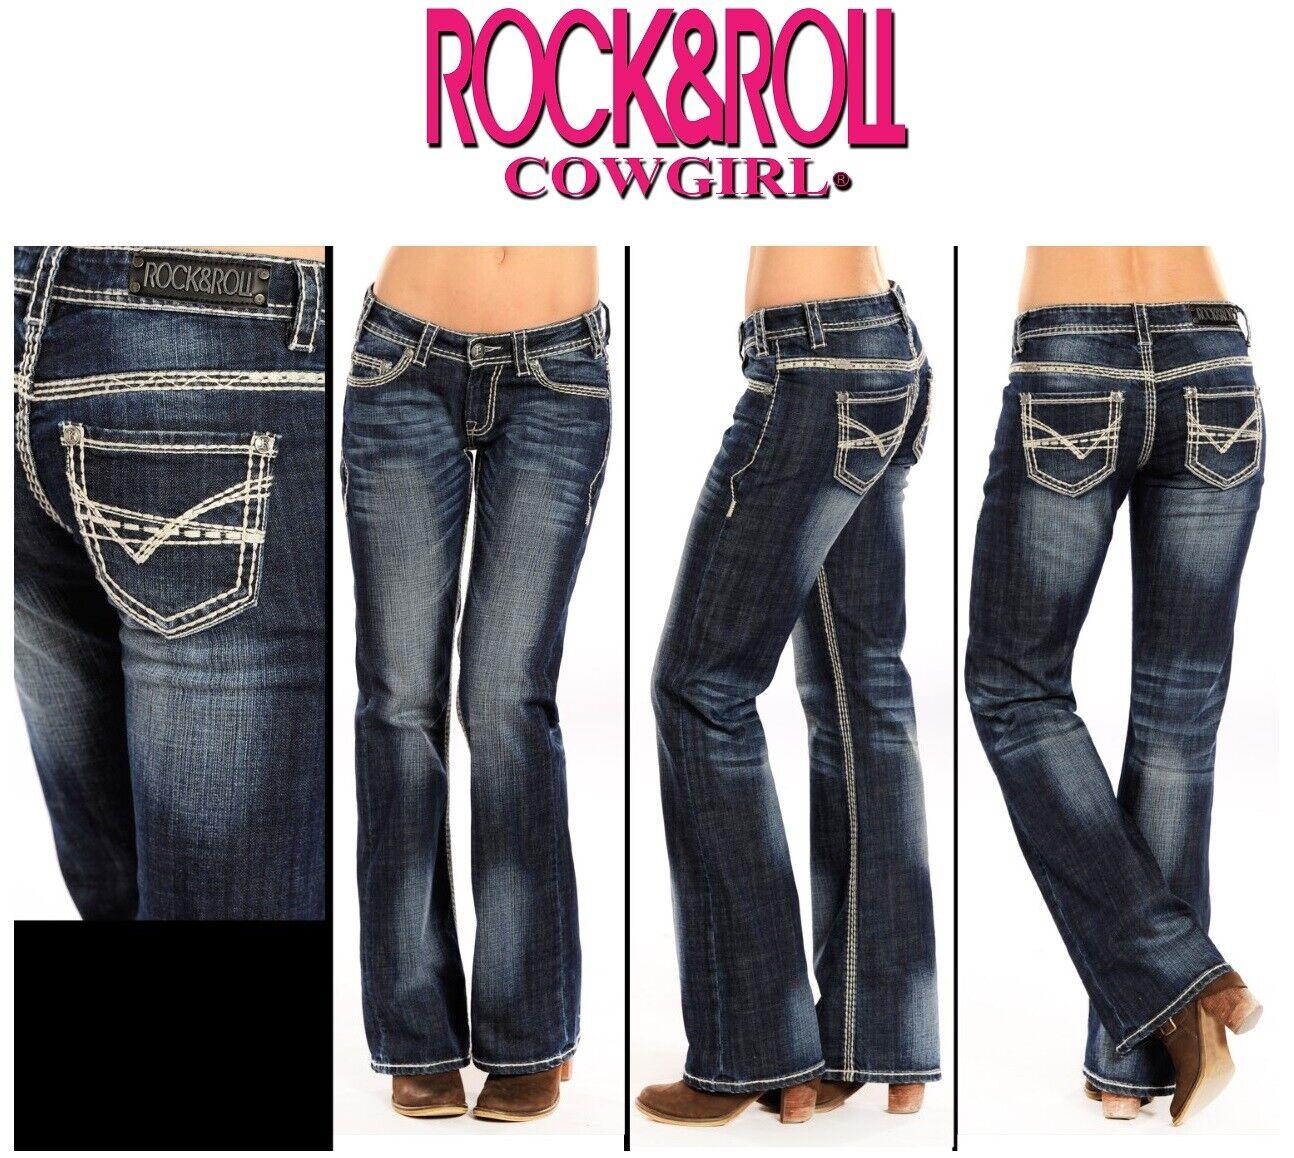 Rock & N Roll Cowgirl Femme Lourd Riding Stiefel Cut Vintage Jeans W7-9516